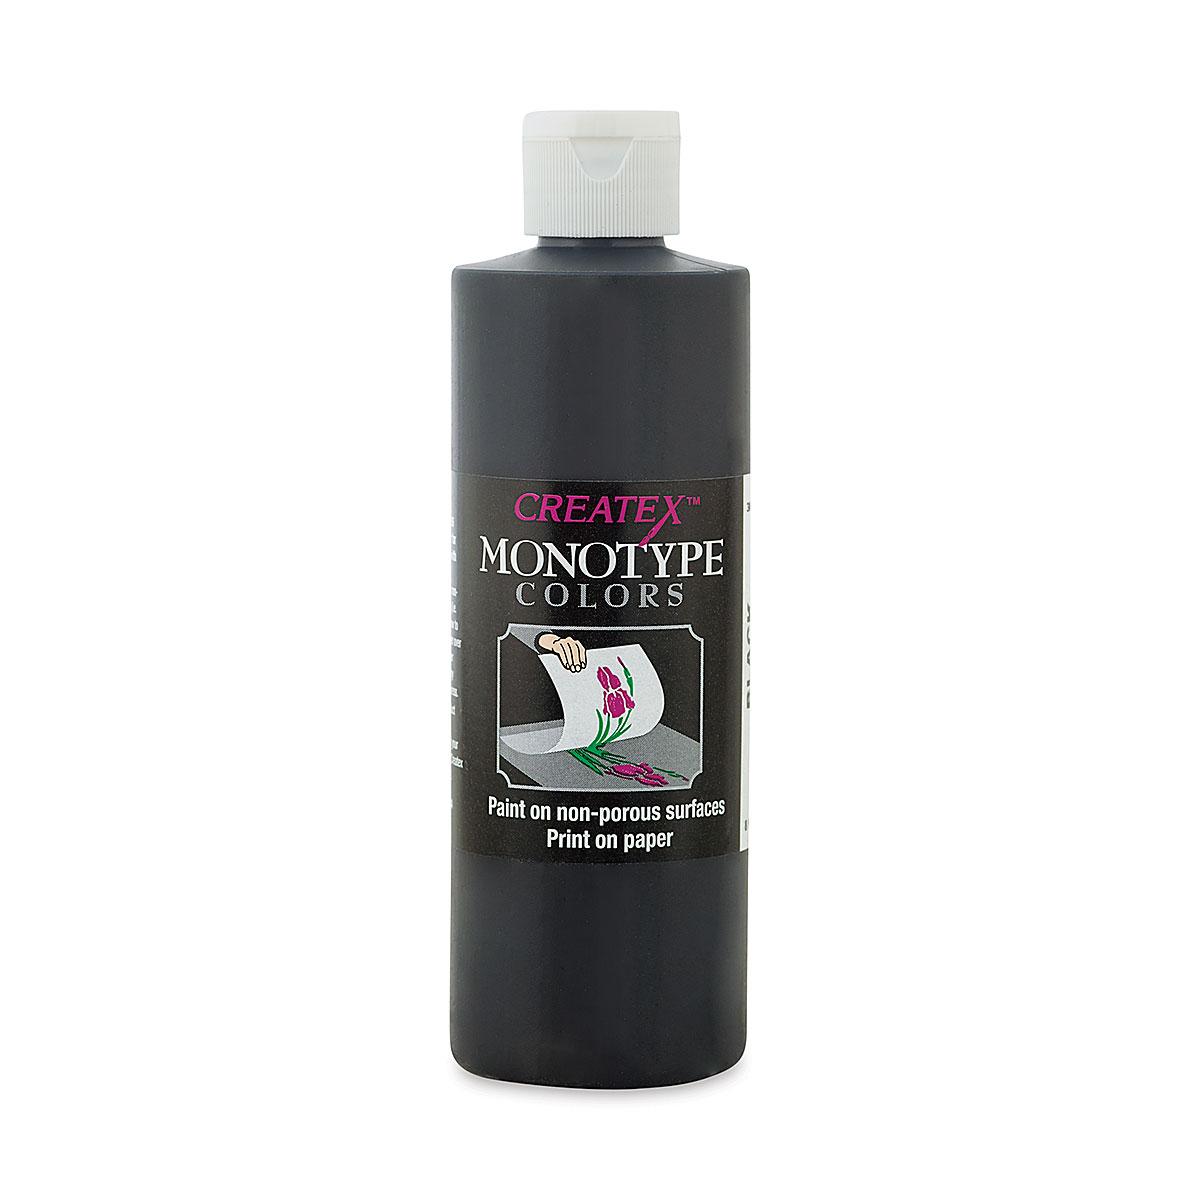 Createx Monotype Colors - Black, 8 oz bottle